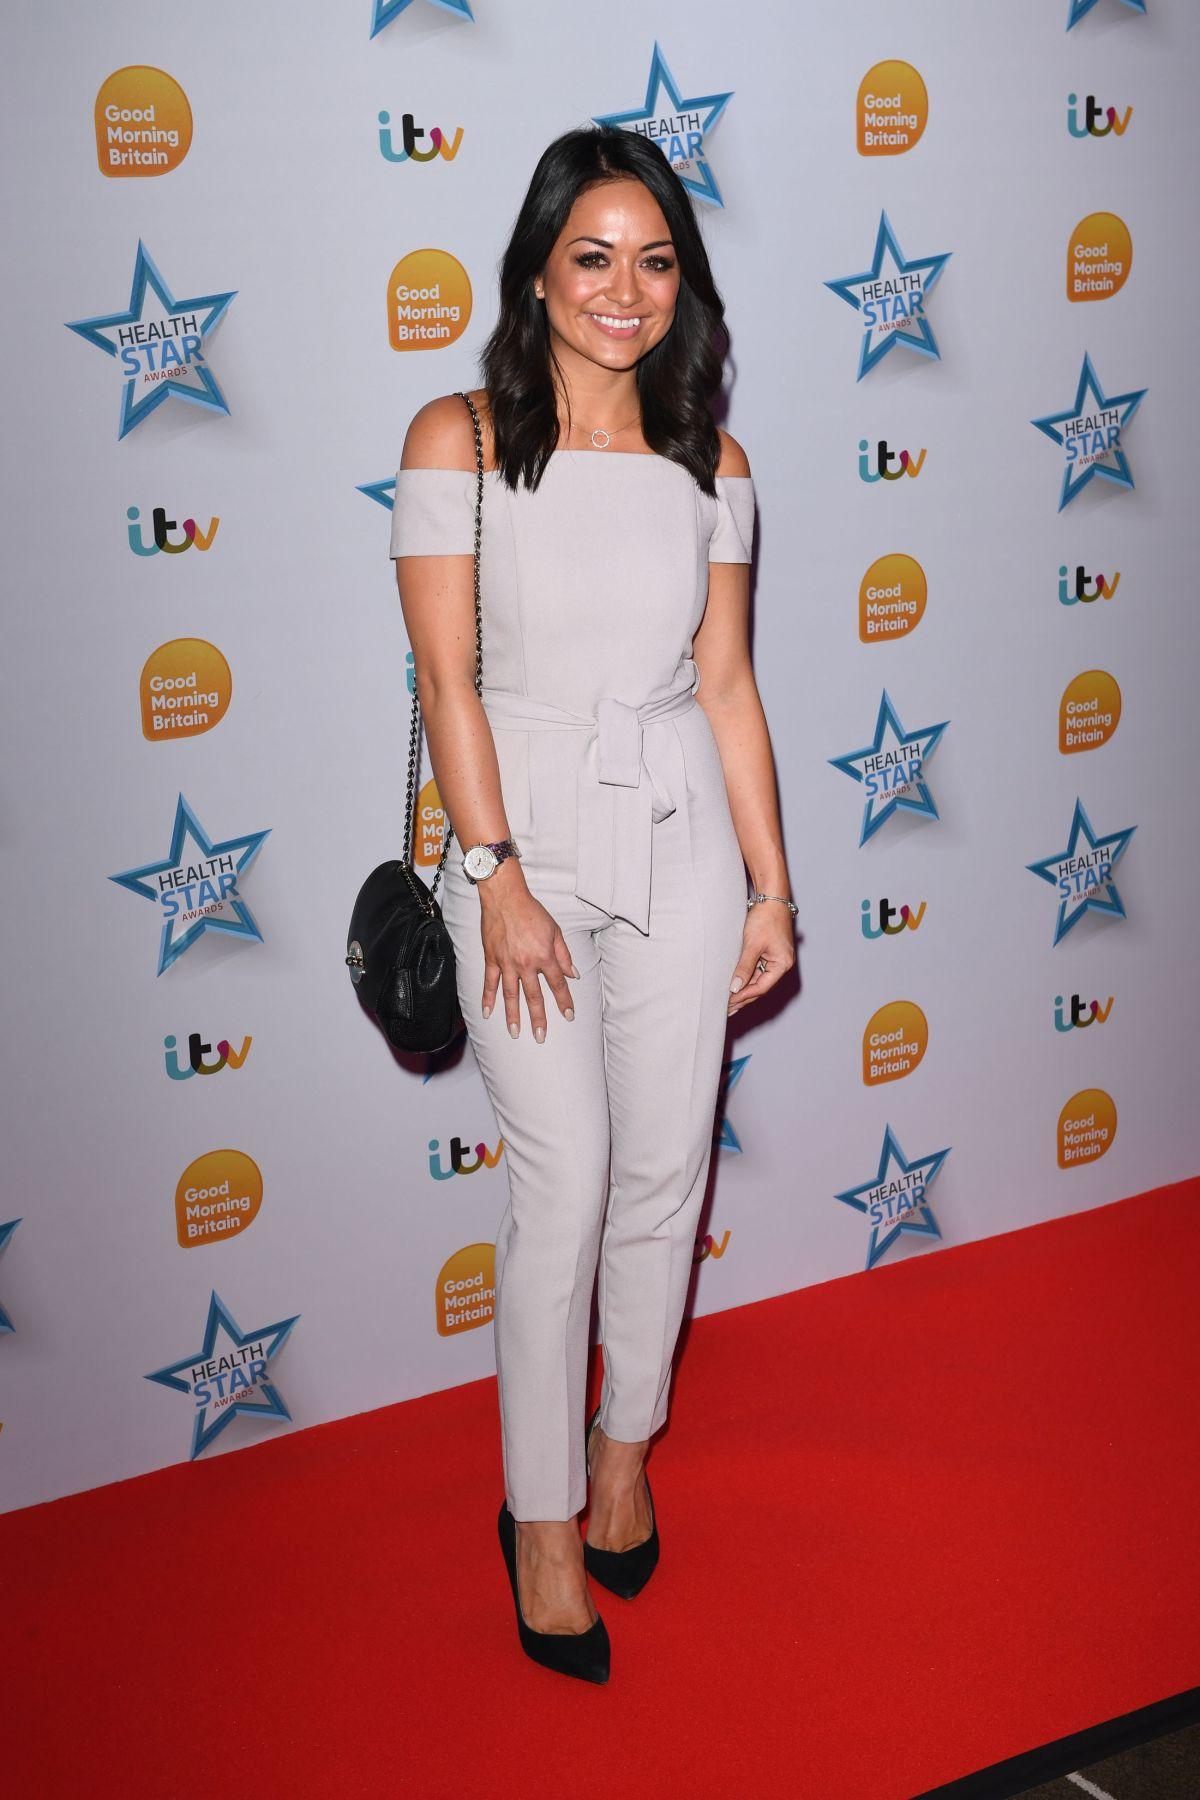 JULES BREACH at Good Morning Britain Health Star Awards in London 04/24/2017